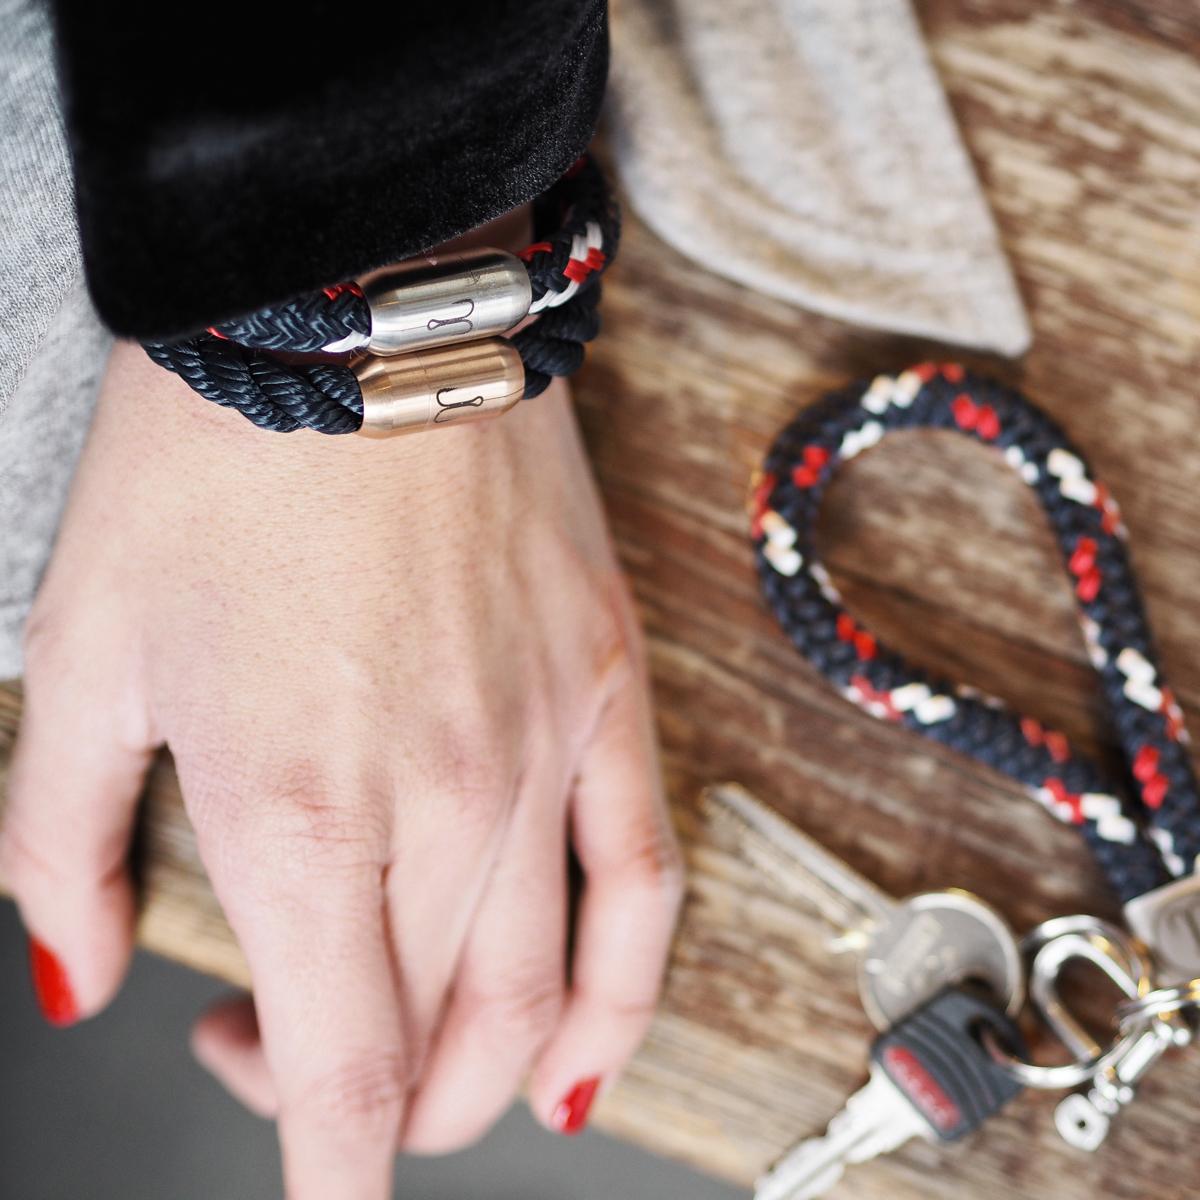 Day 4   5 x bracelet & keychain by Fischers Fritze   How I met my outfit by Dana Lohmüller   Blogger Adventskalender 2016